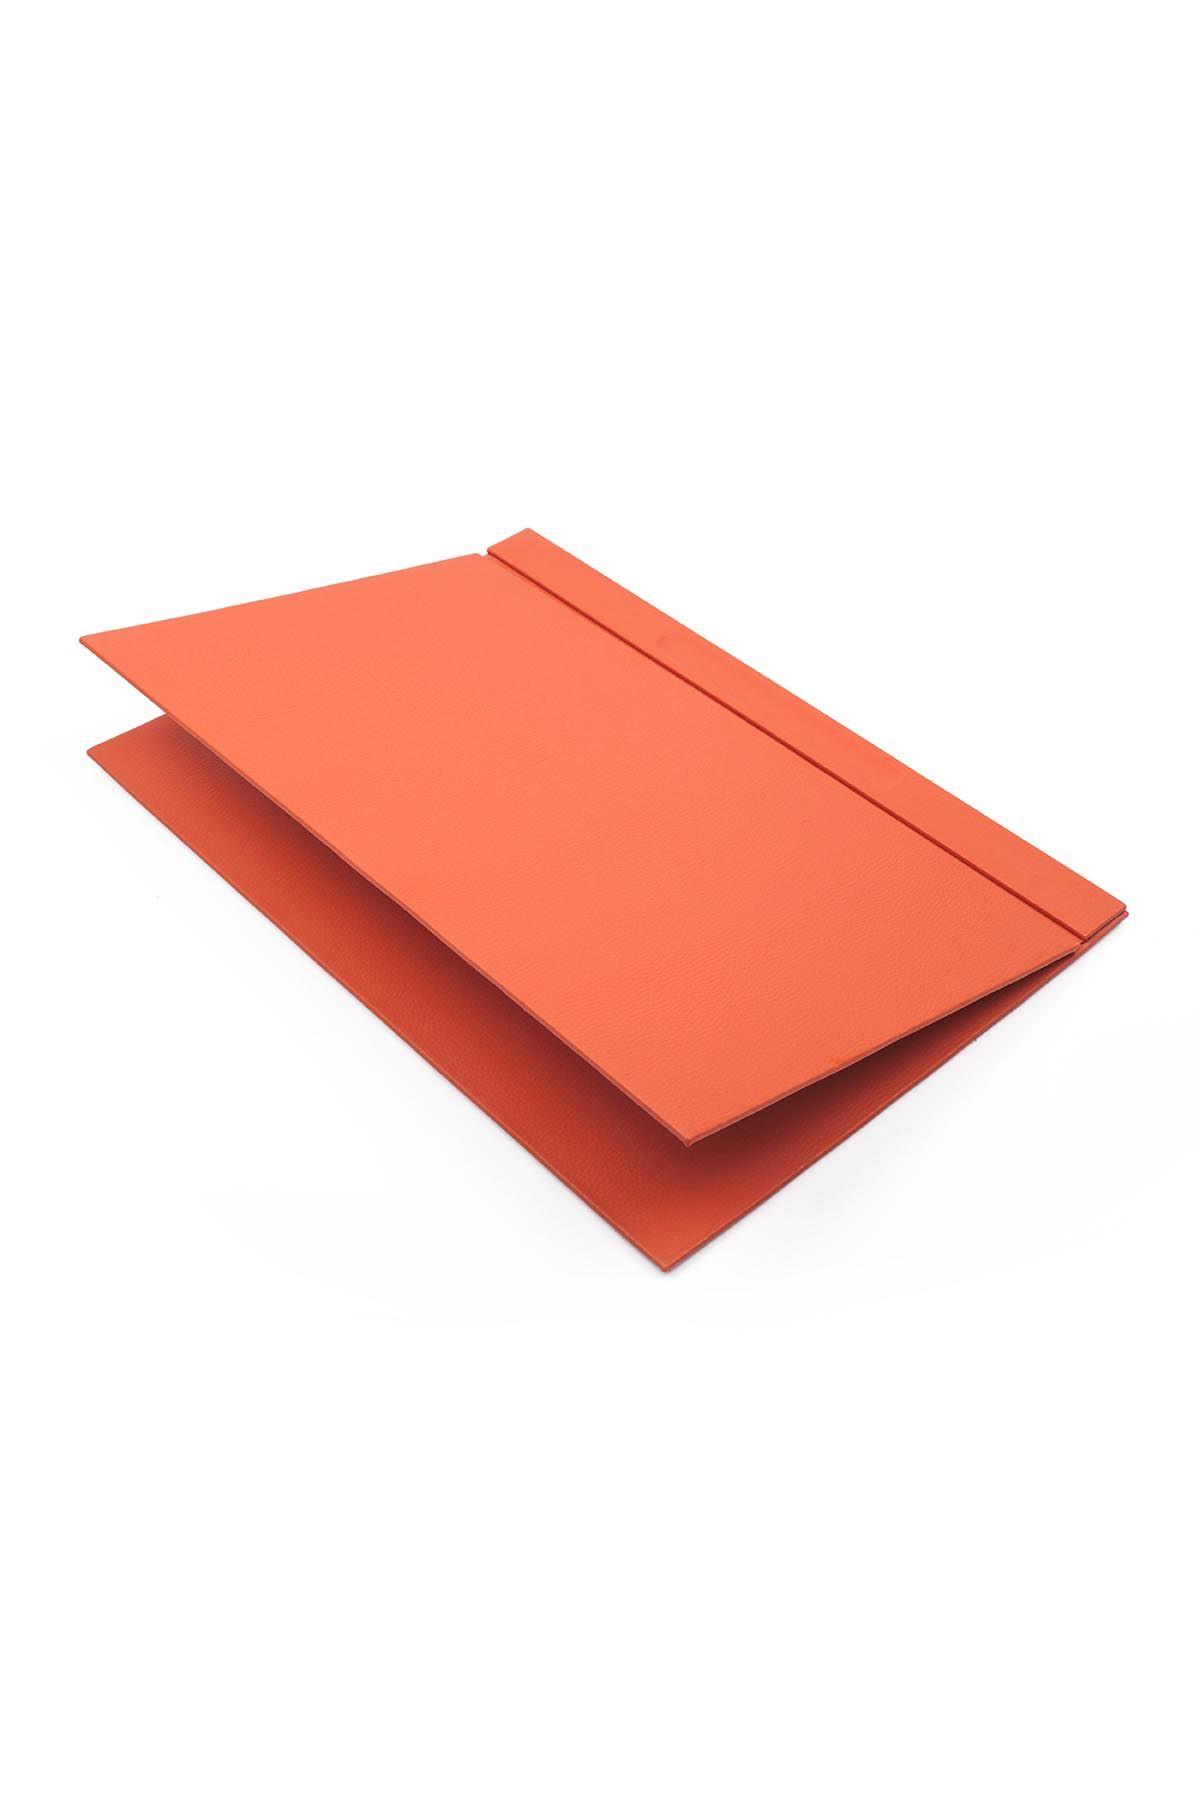 Luxury Leather Desk Set Orange 10 Accessories - Double Document Tray